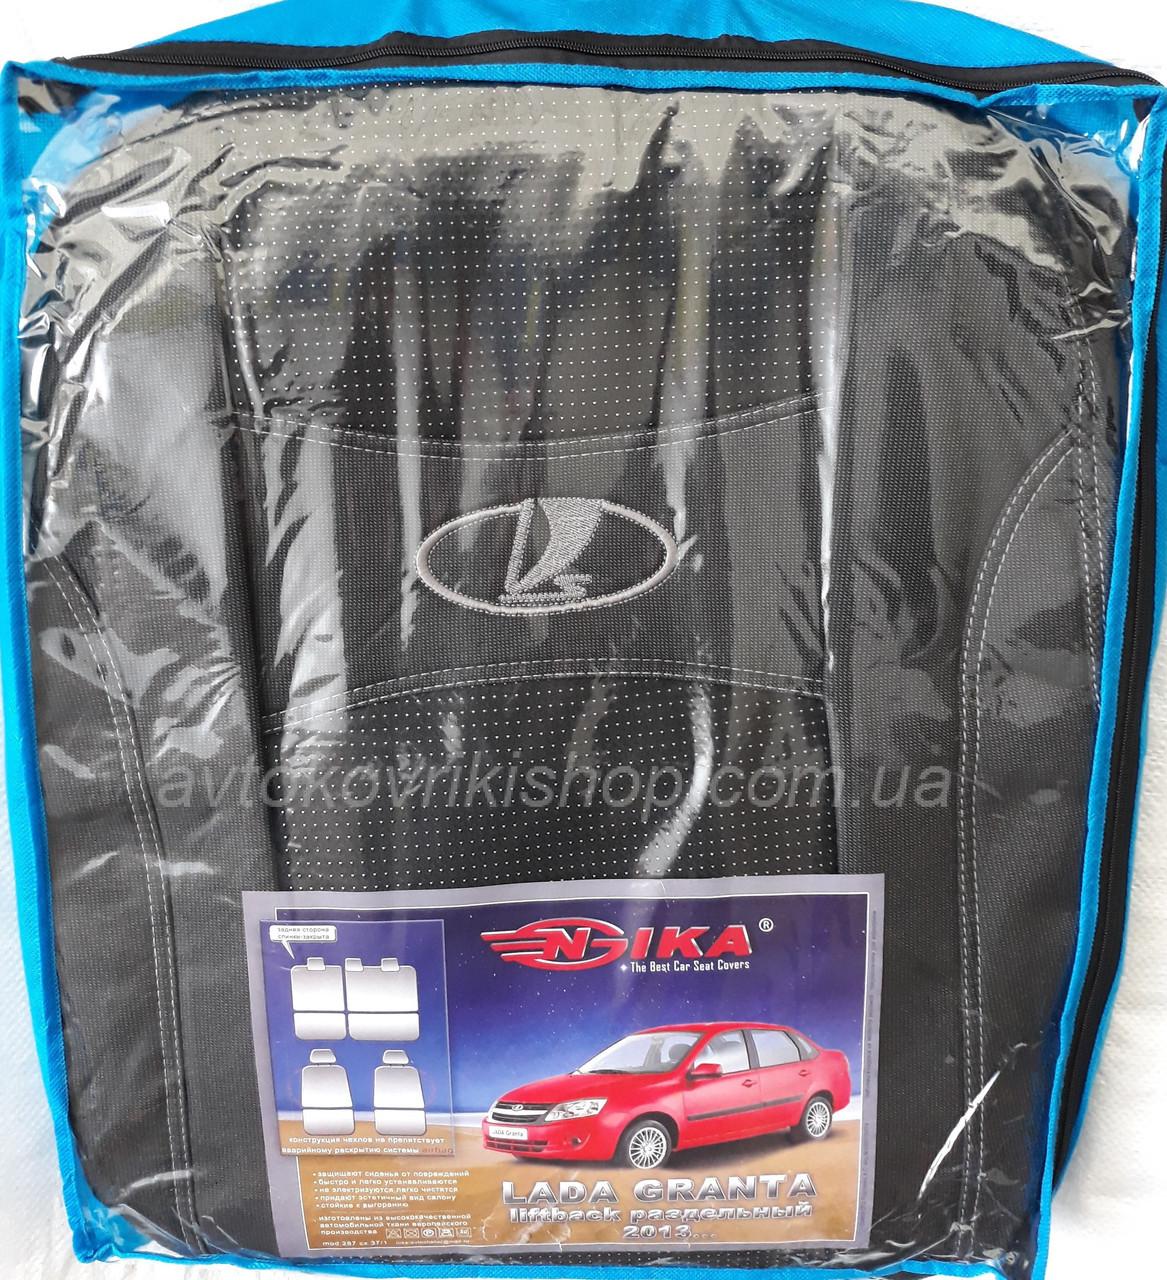 Авто чехлы Lada Granta Liftback 2013-2018 Nika